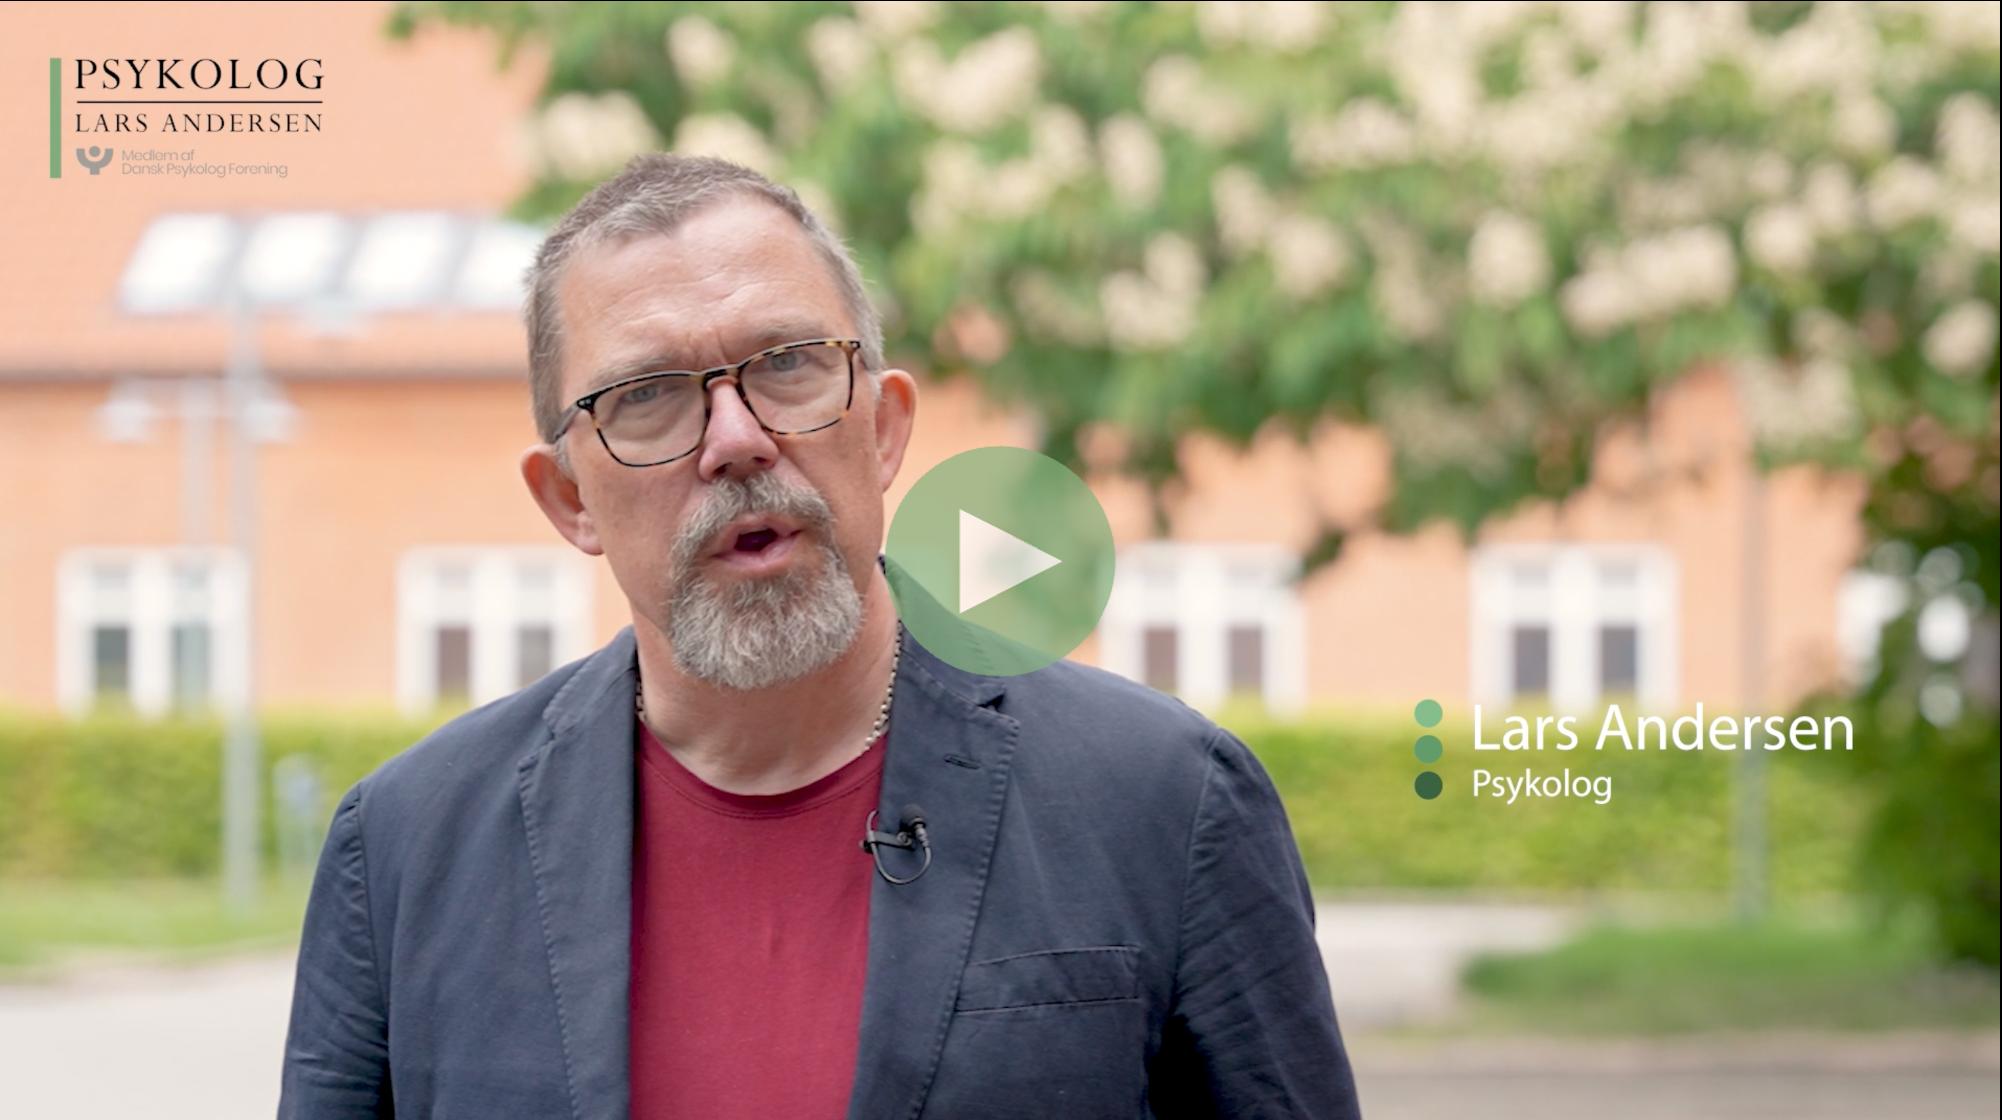 Beredskab psykolog Lars Andersen